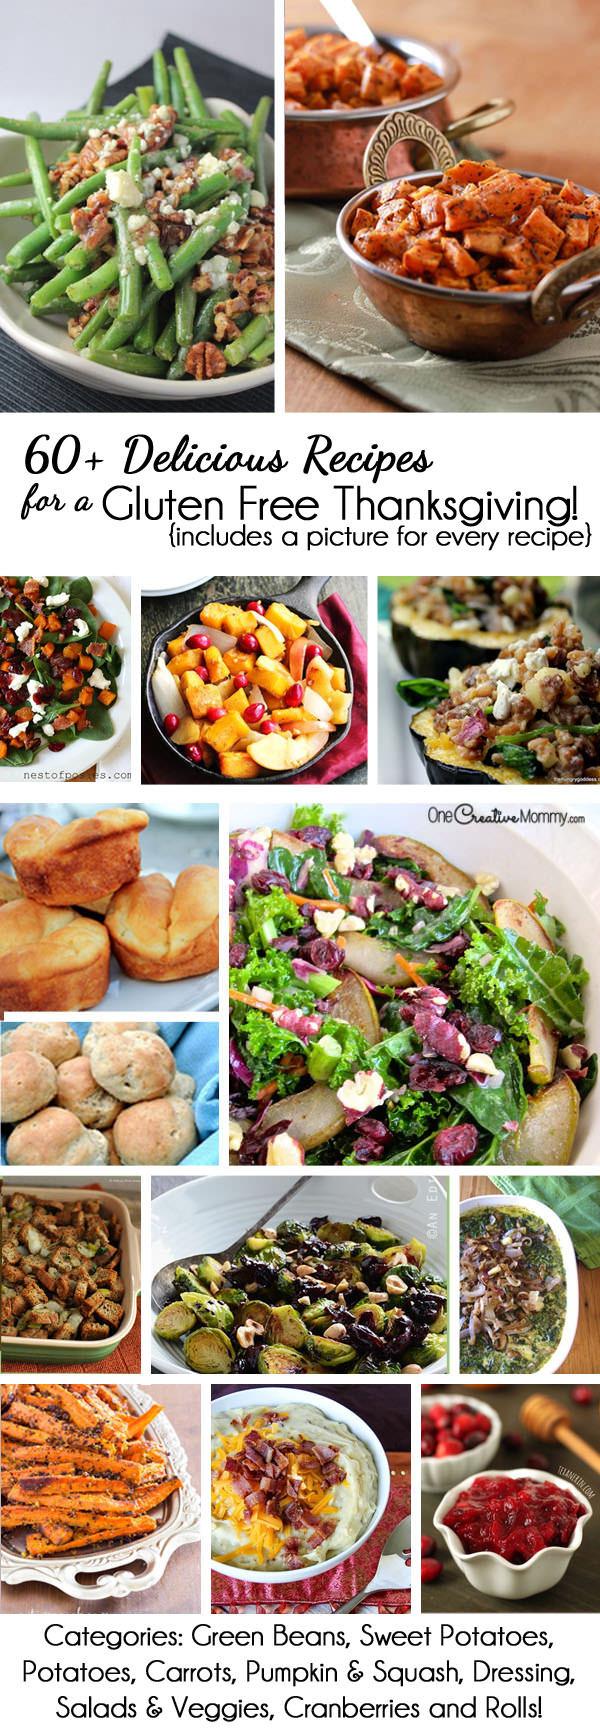 Gluten Free Thanksgiving  60 Gluten Free Thanksgiving Recipes onecreativemommy